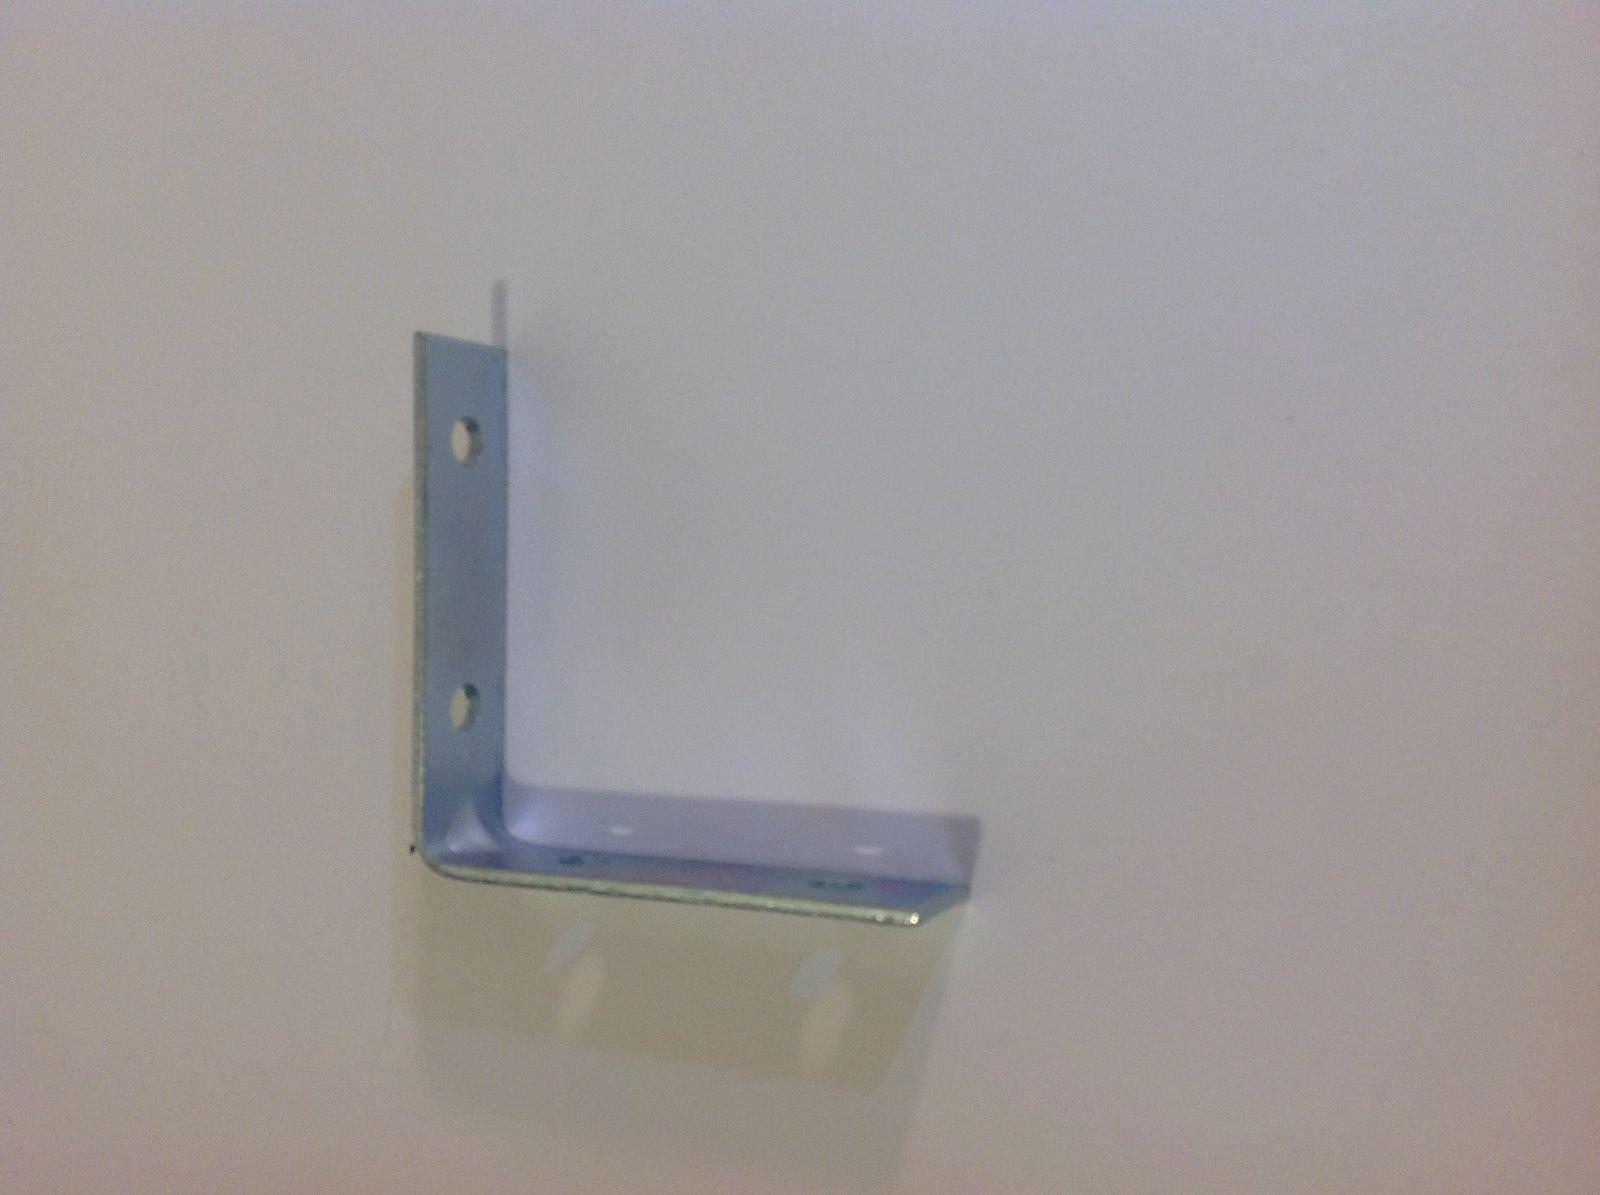 ALF_CAD 3 x 3 L Bracket Angle Iron Corner Brace Joint Metal Install Shelf Cabinet